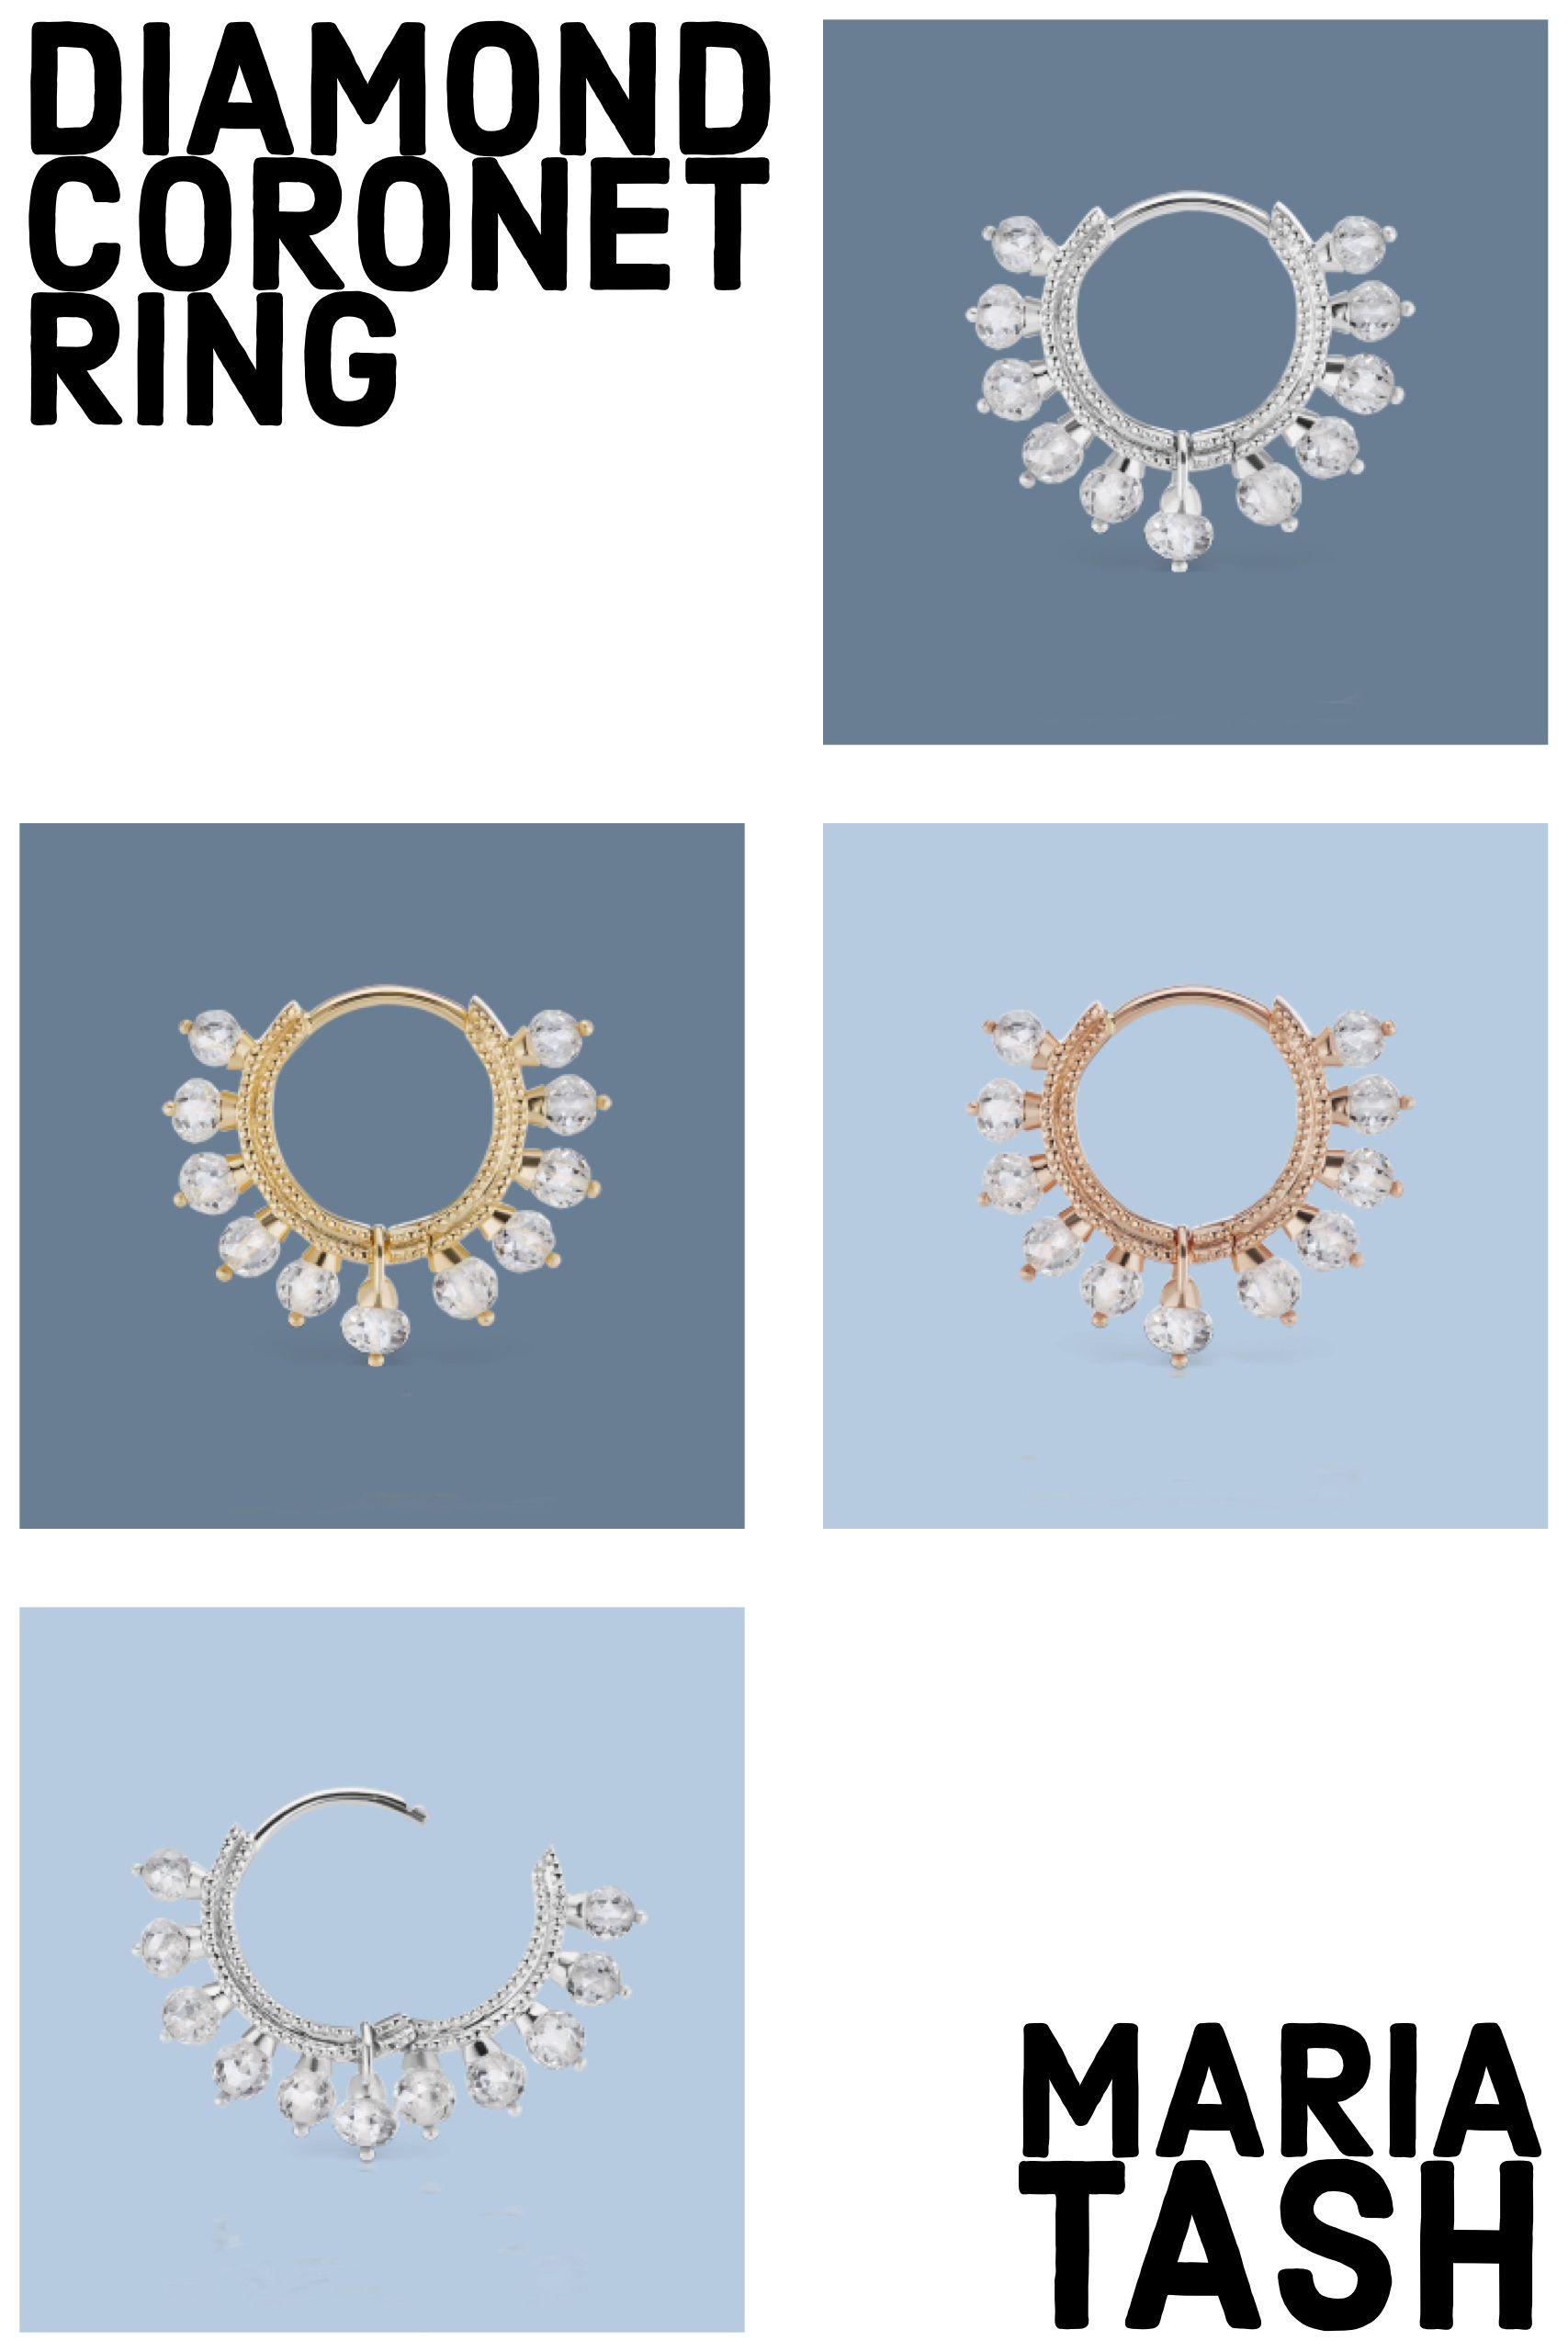 Piercing above top lip  Diamond Coronet Ring  Maria Tash  Septum Jewelry  Pinterest